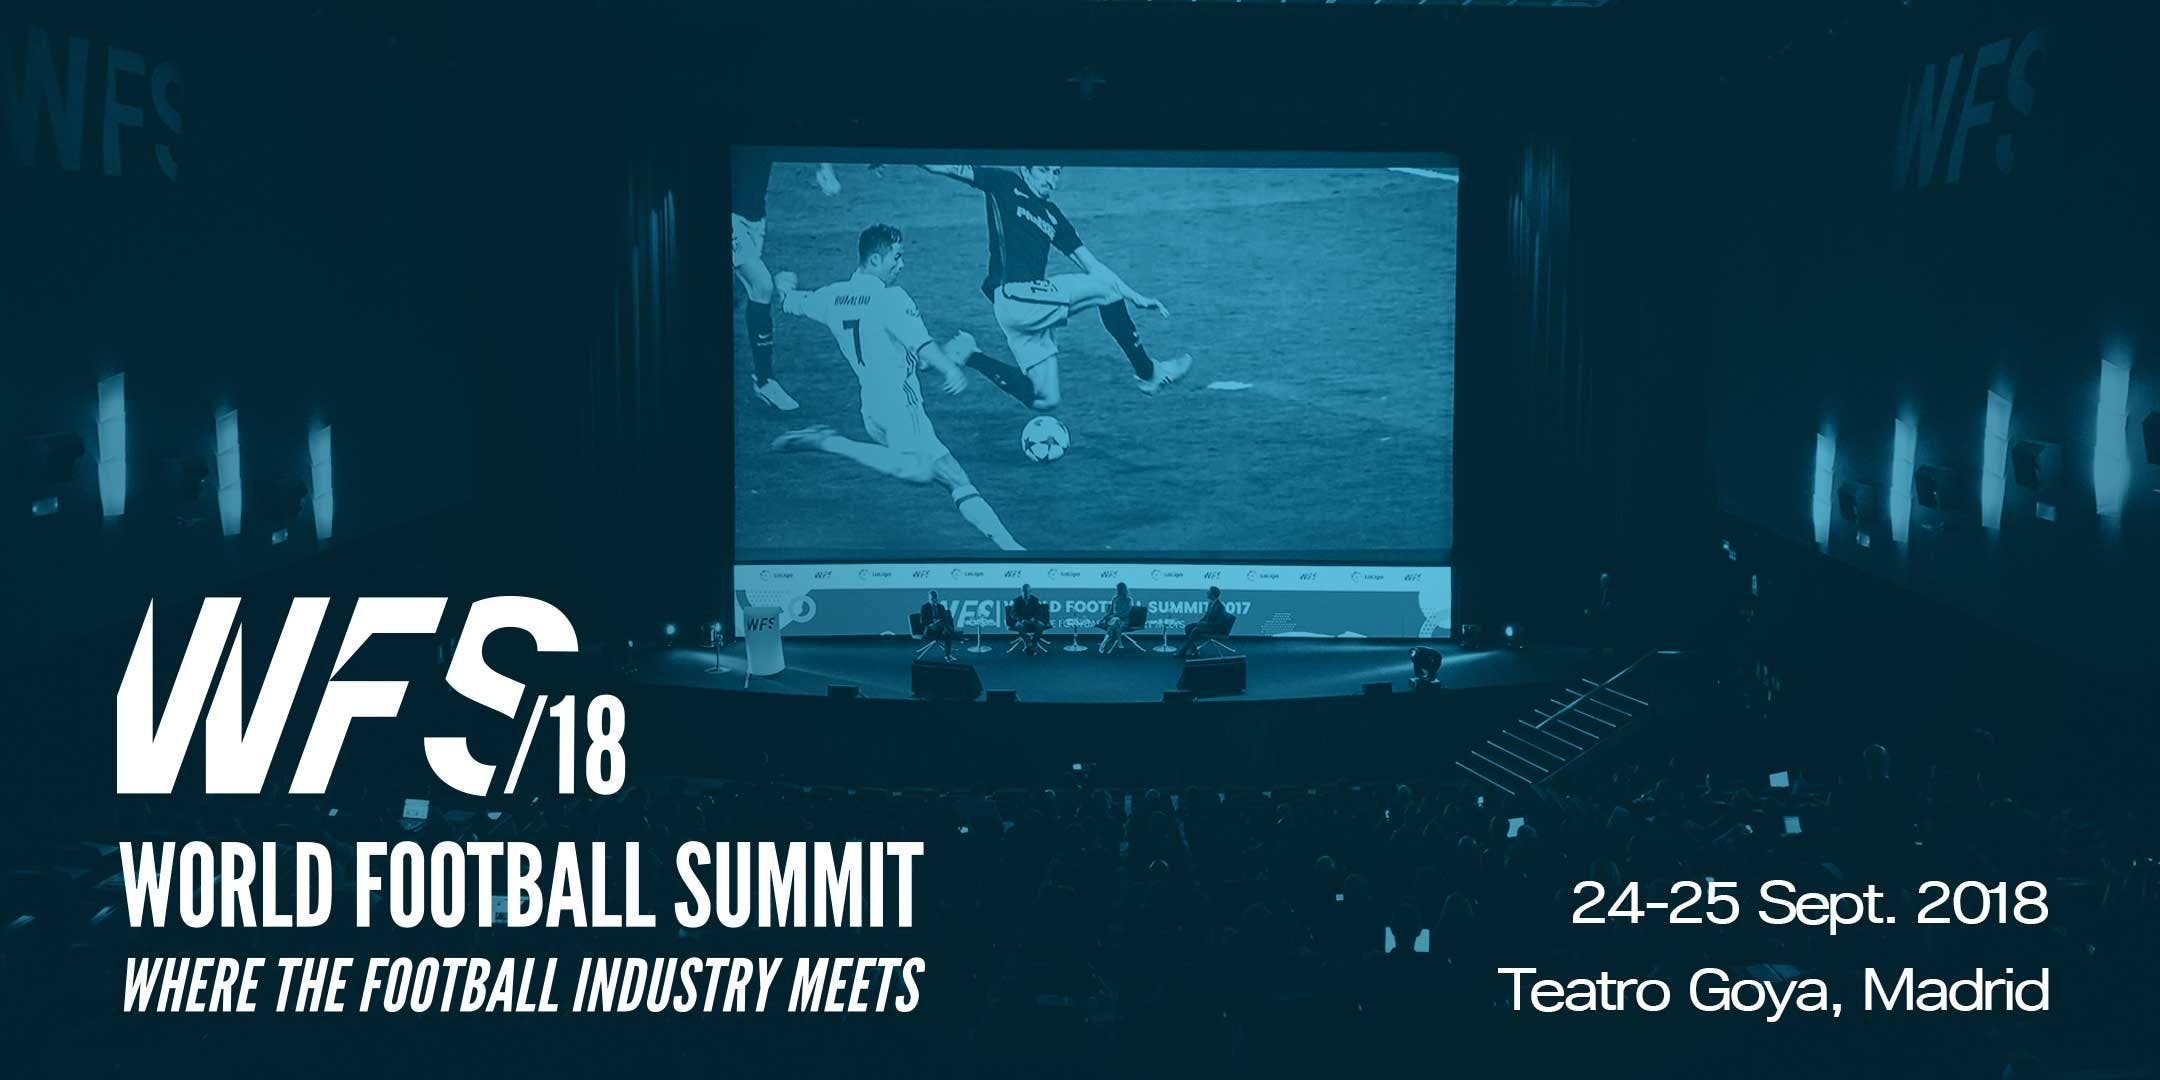 édition 2018 du World Football Summit de Madrid